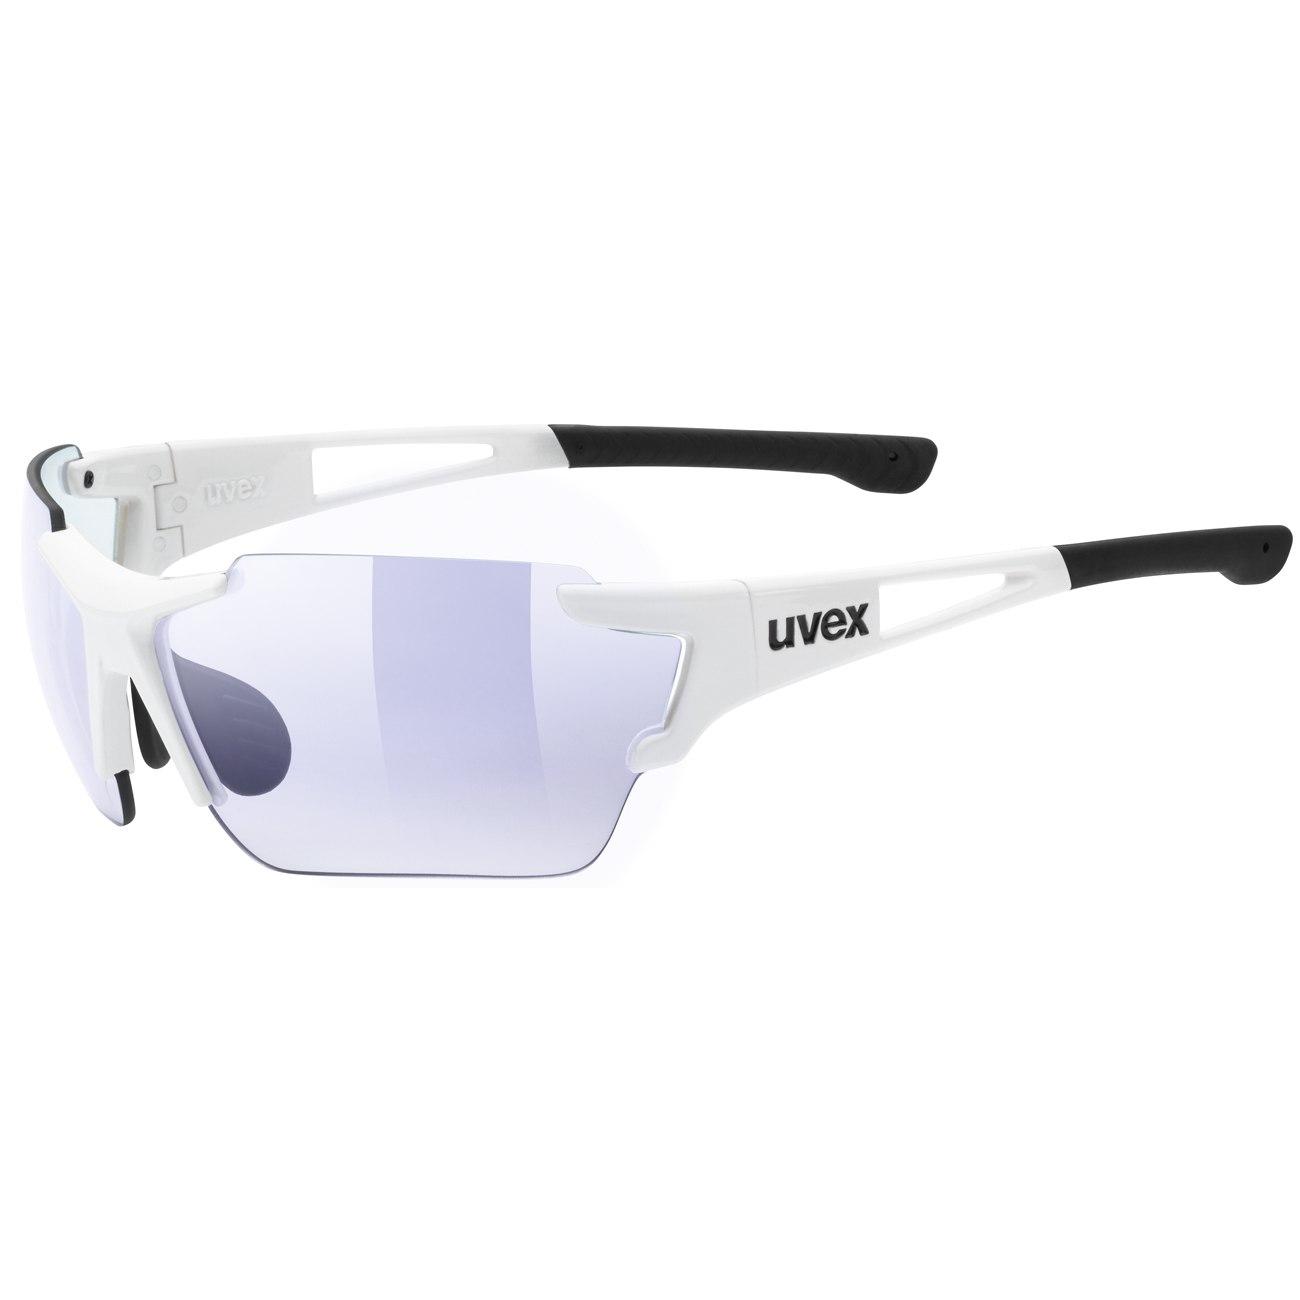 Uvex sportstyle 803 race vm - white/variomatic litemirror blue Brille